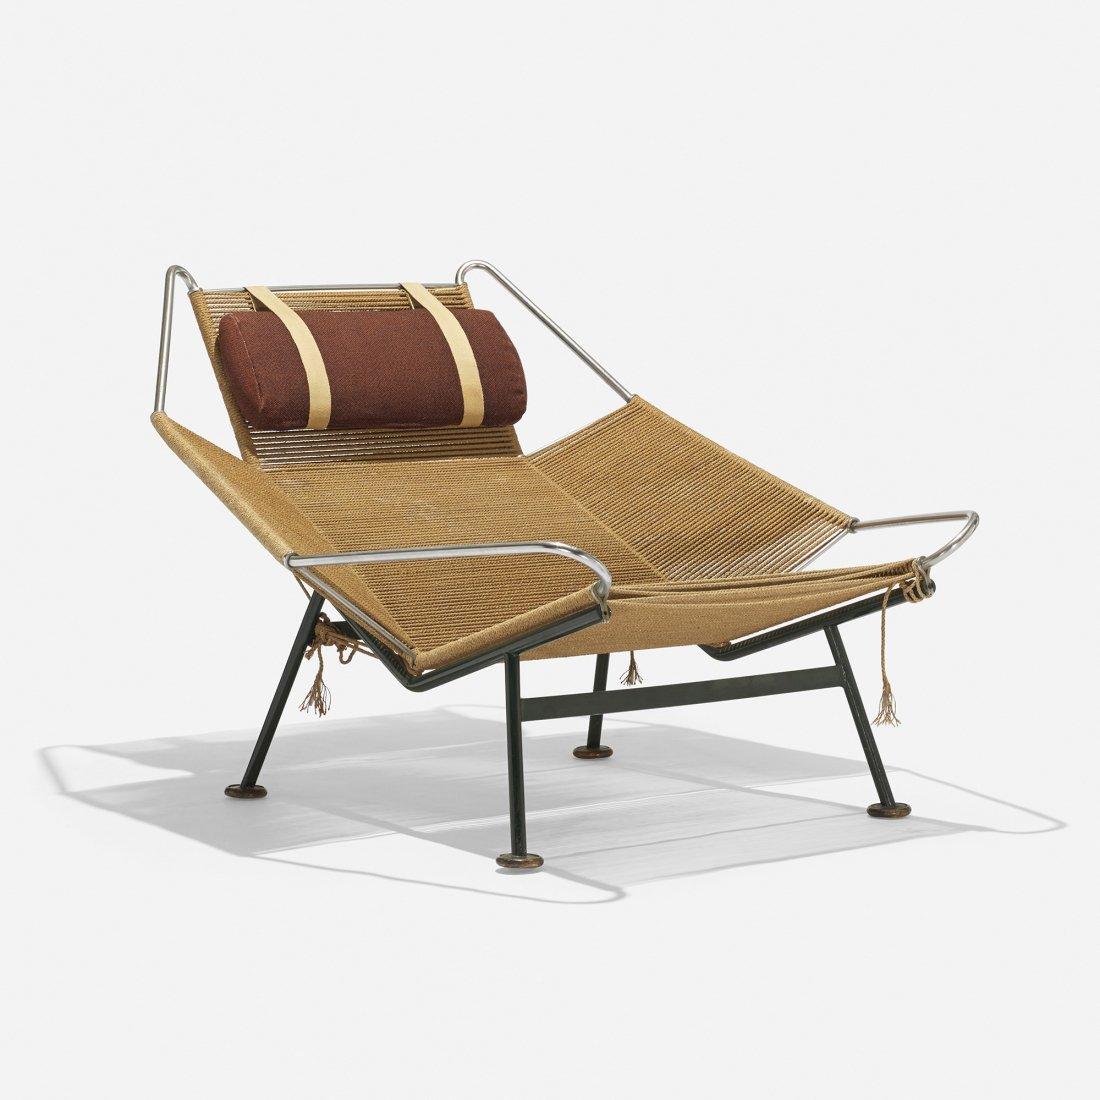 Wegner Flag Halyard chair